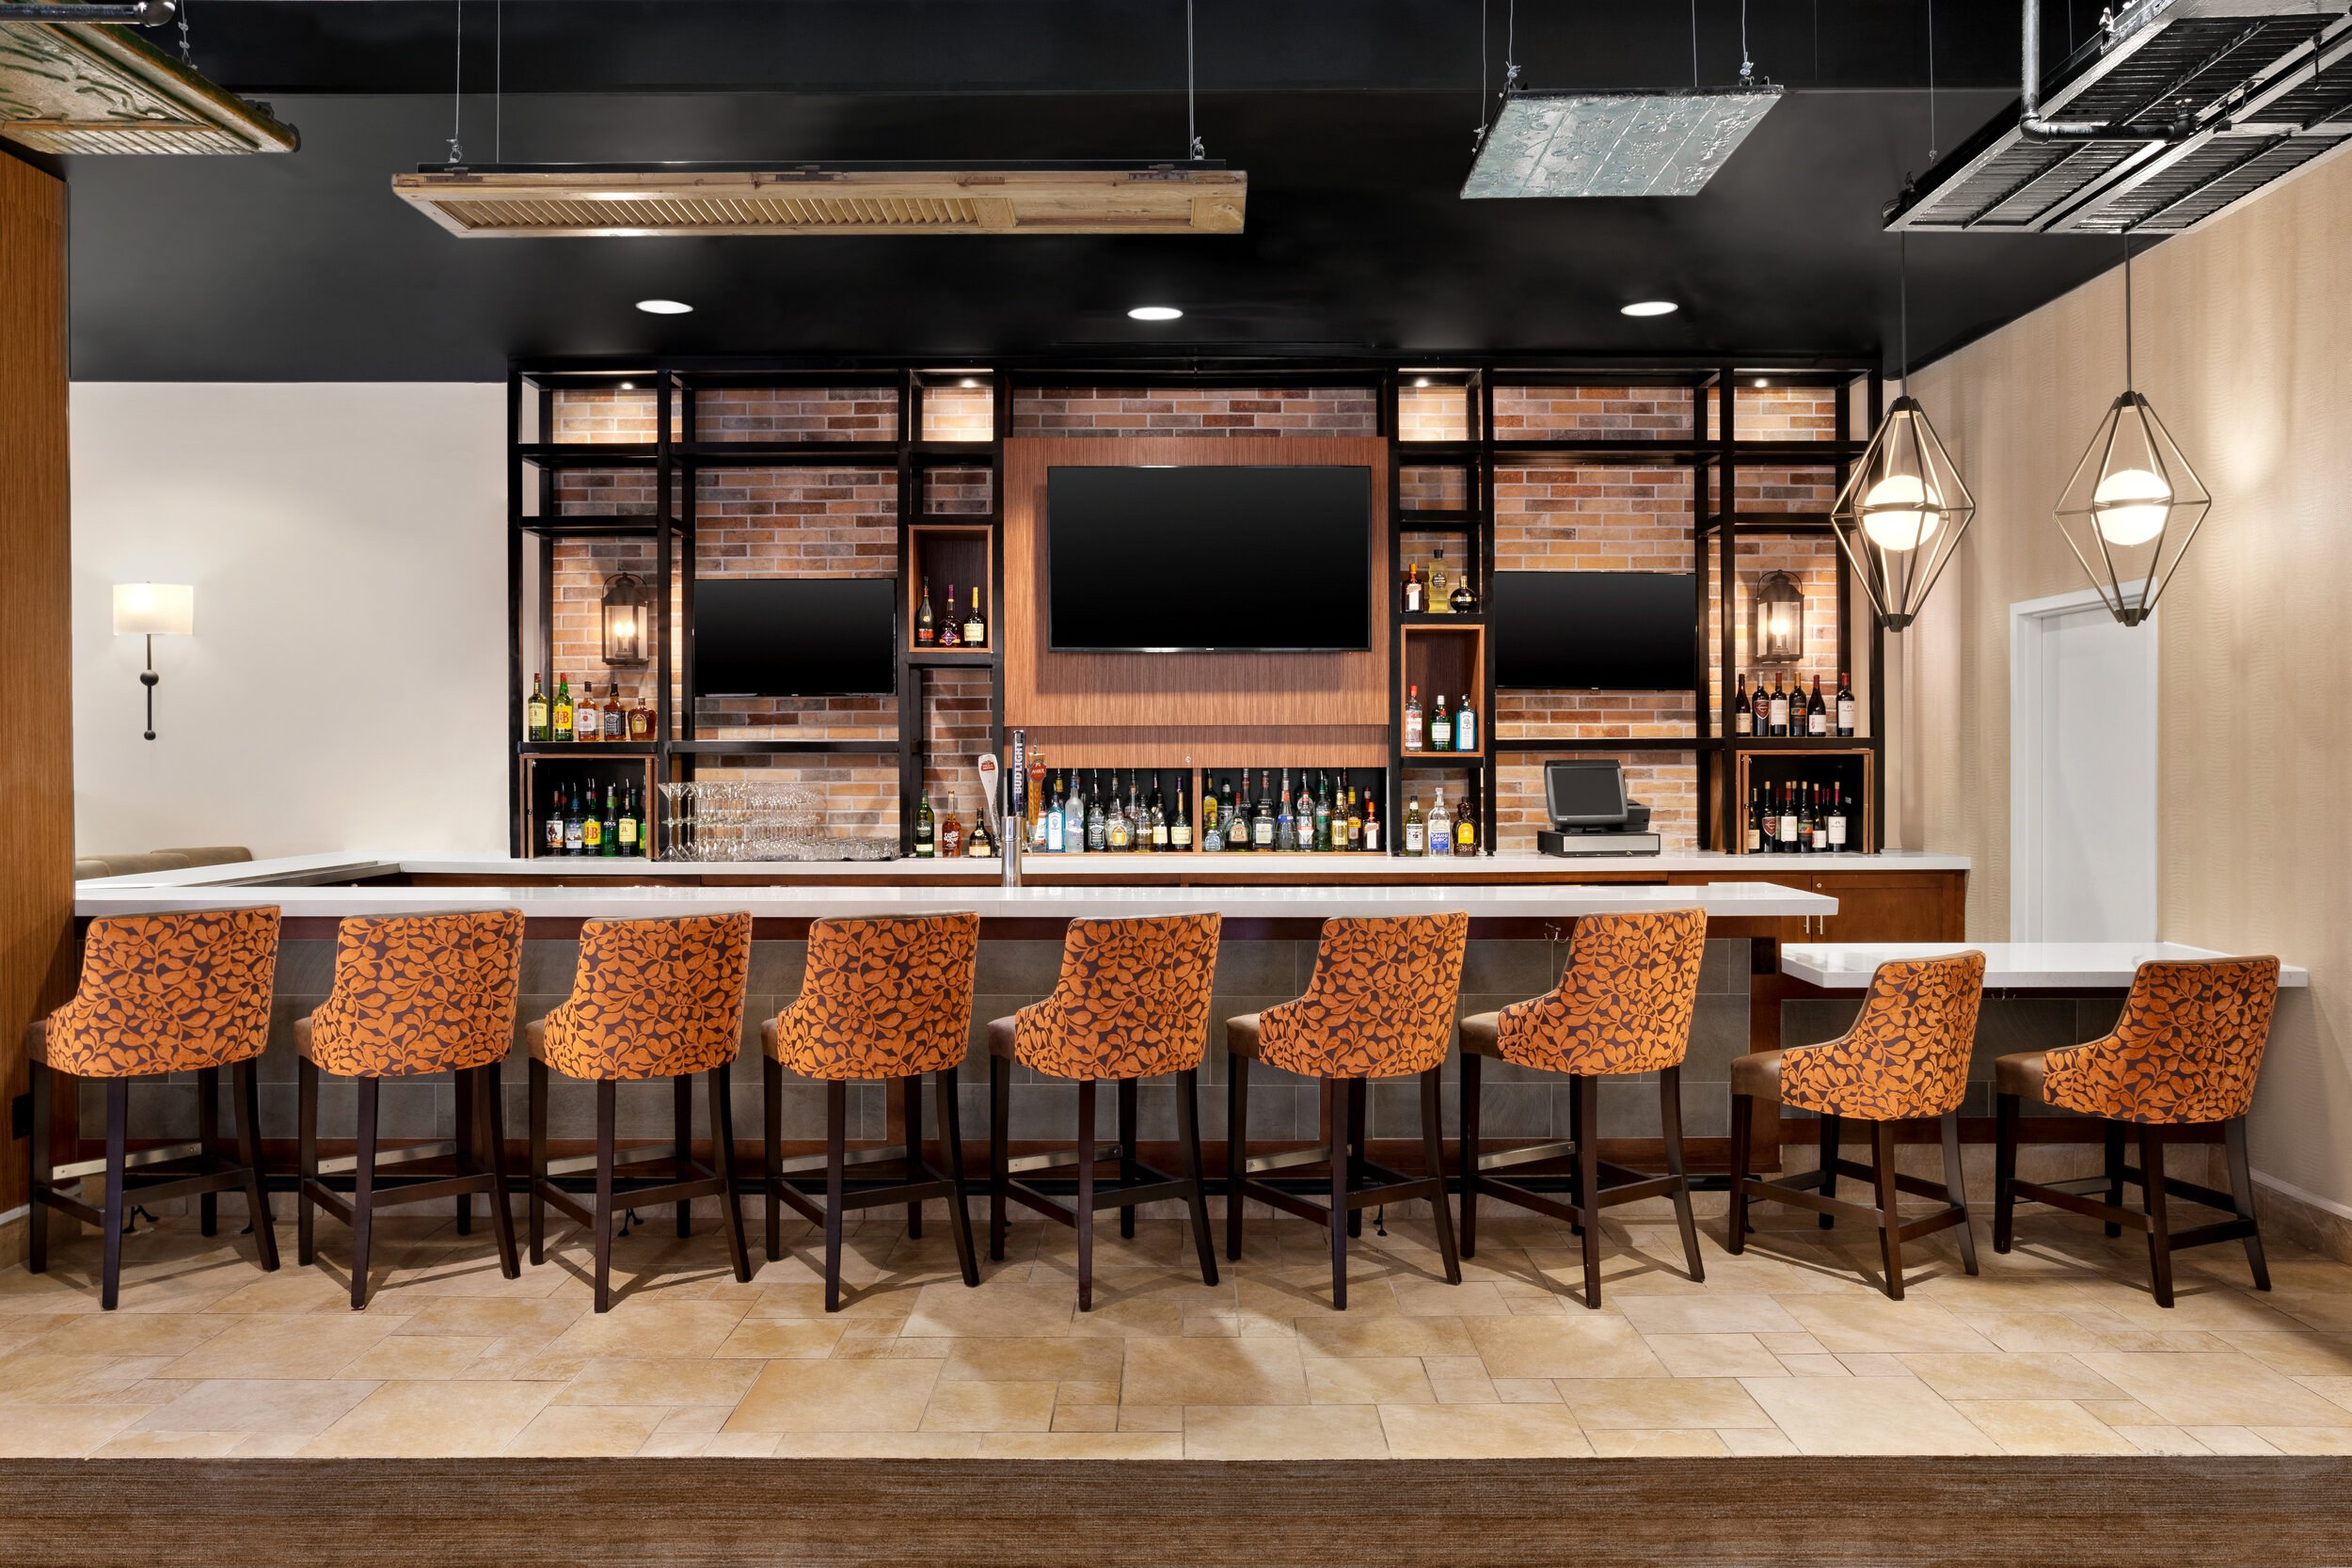 MSYGI_Restaurant_Bar_Angles_02.jpg